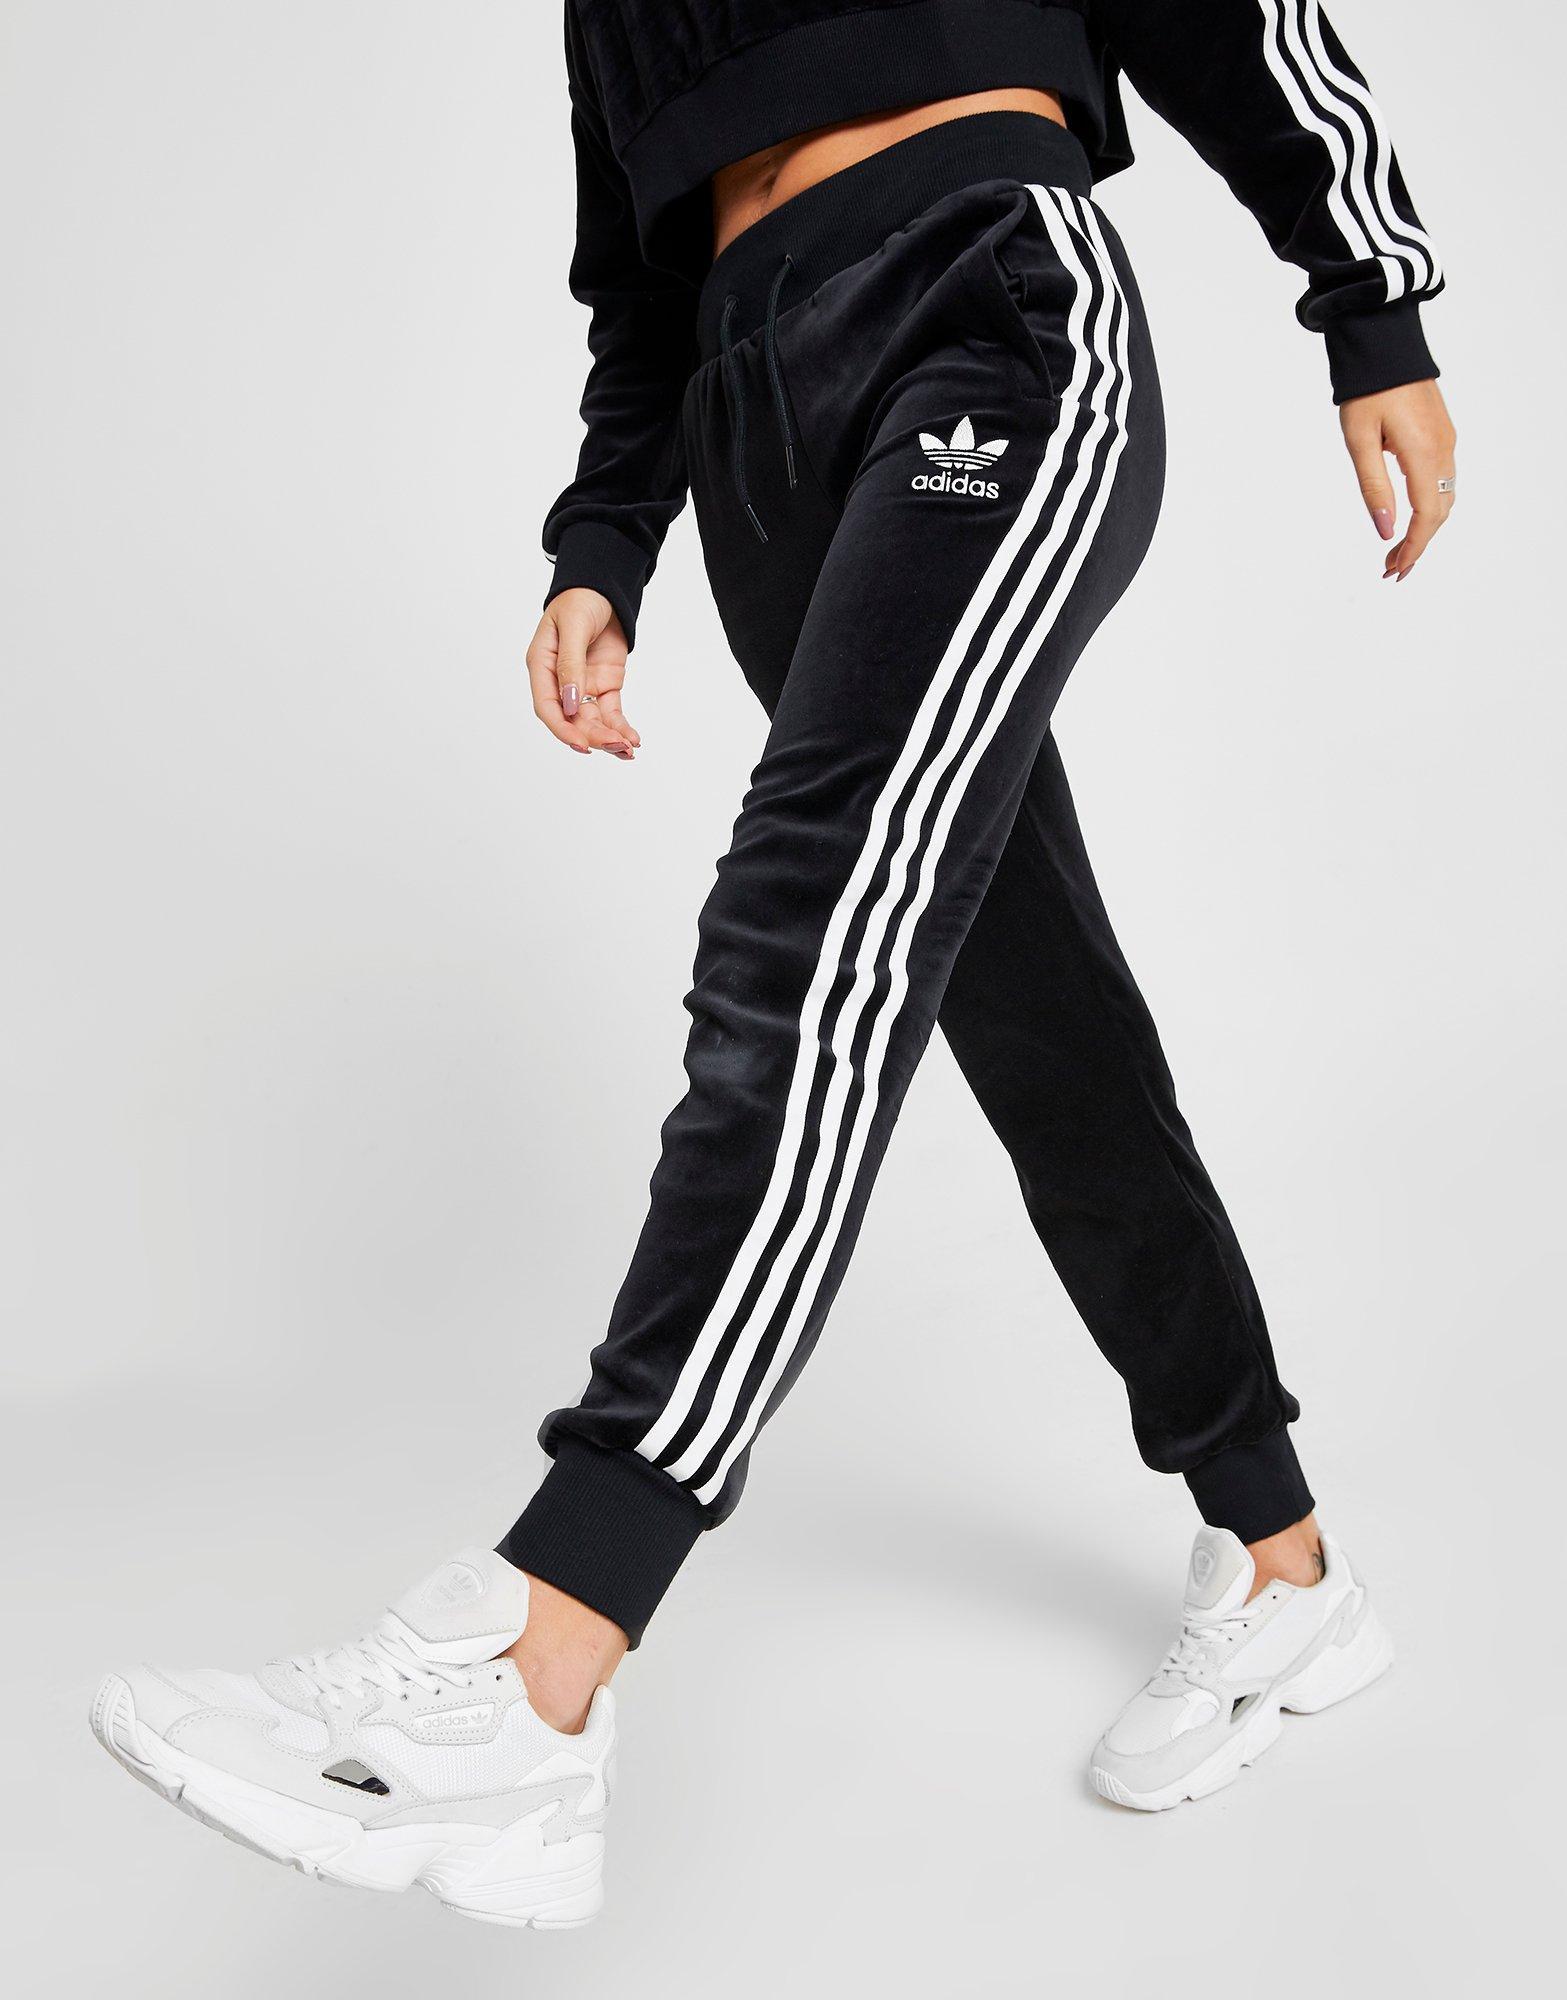 adidas femme joging